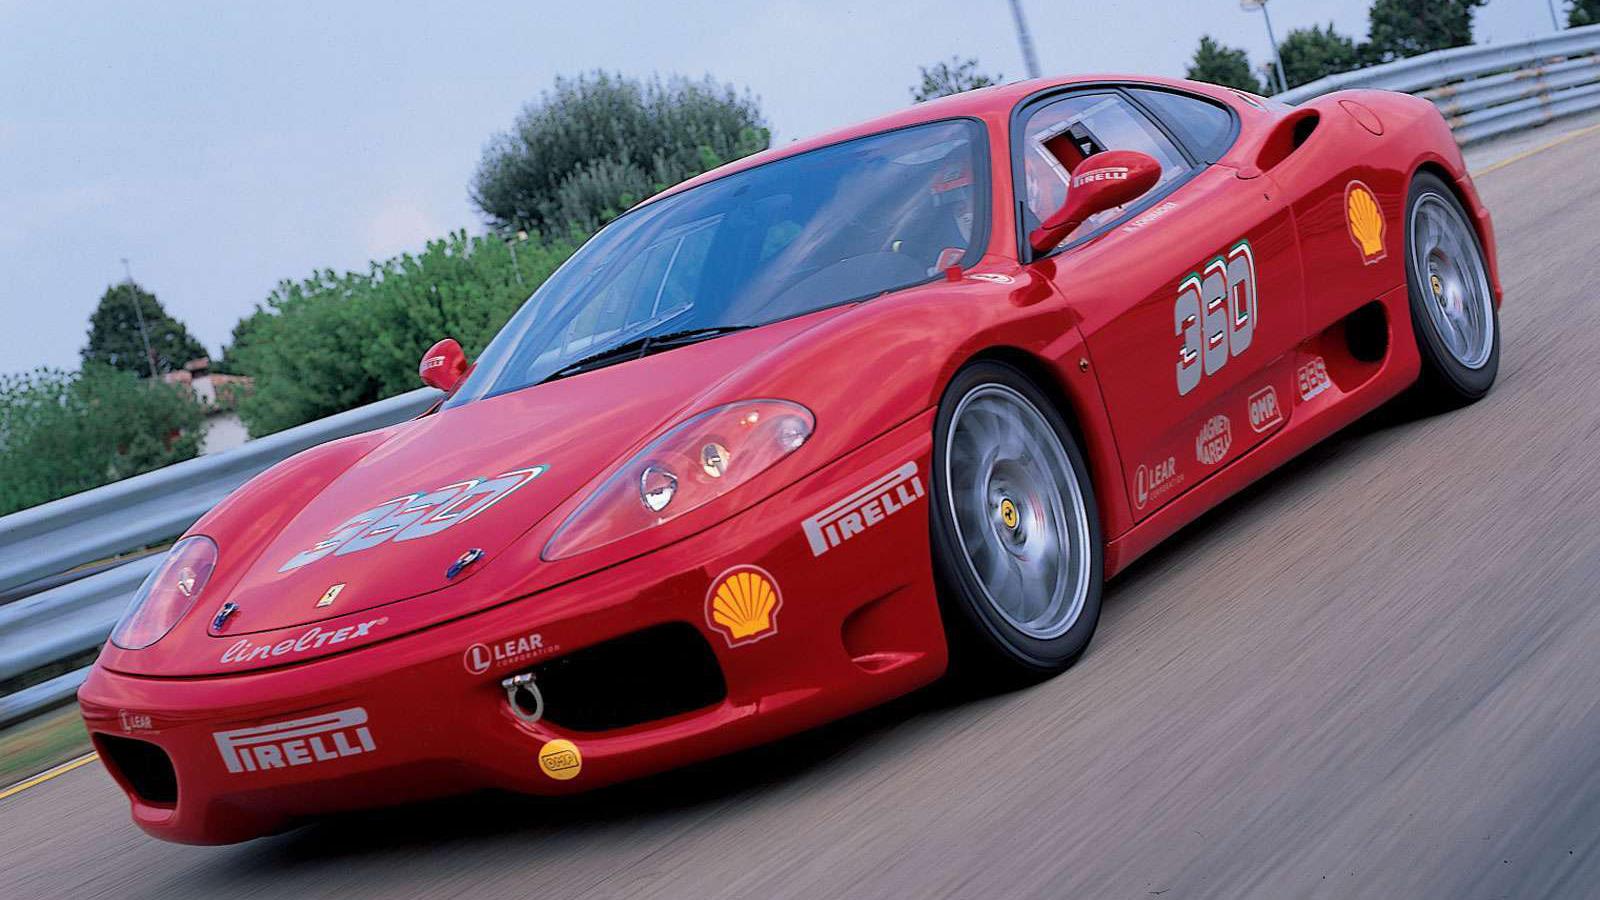 ferrari 360 modena group n gt 2000 racing cars. Black Bedroom Furniture Sets. Home Design Ideas